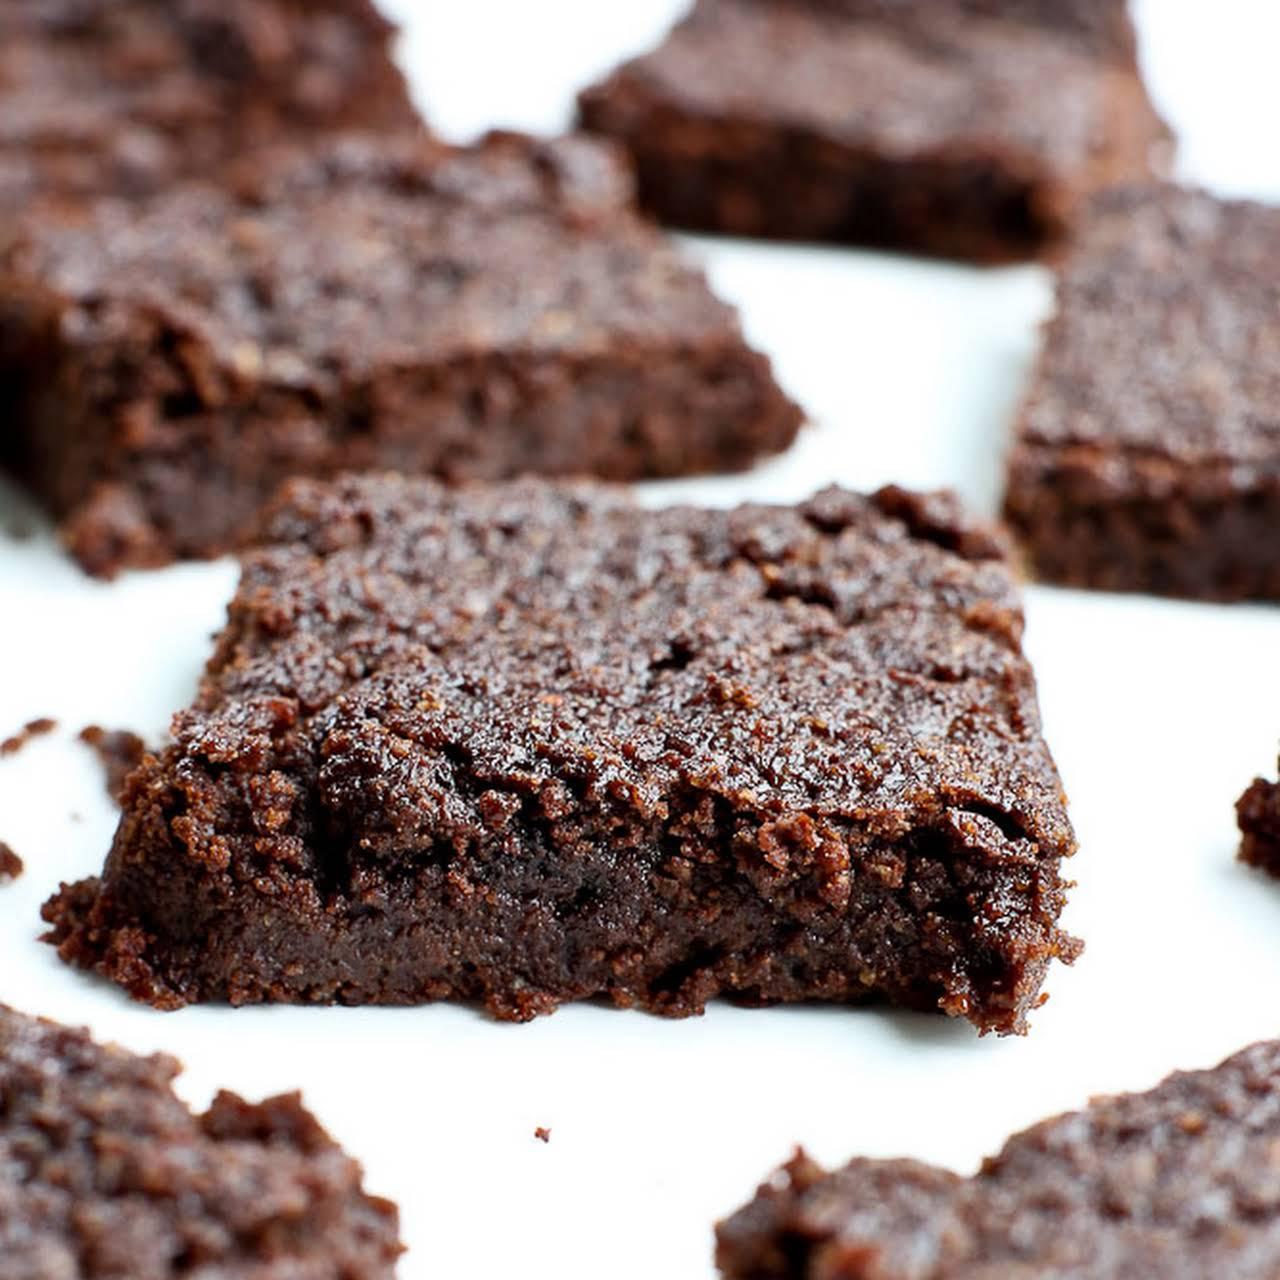 Keto Brownies (Vegan and Gluten Free!)